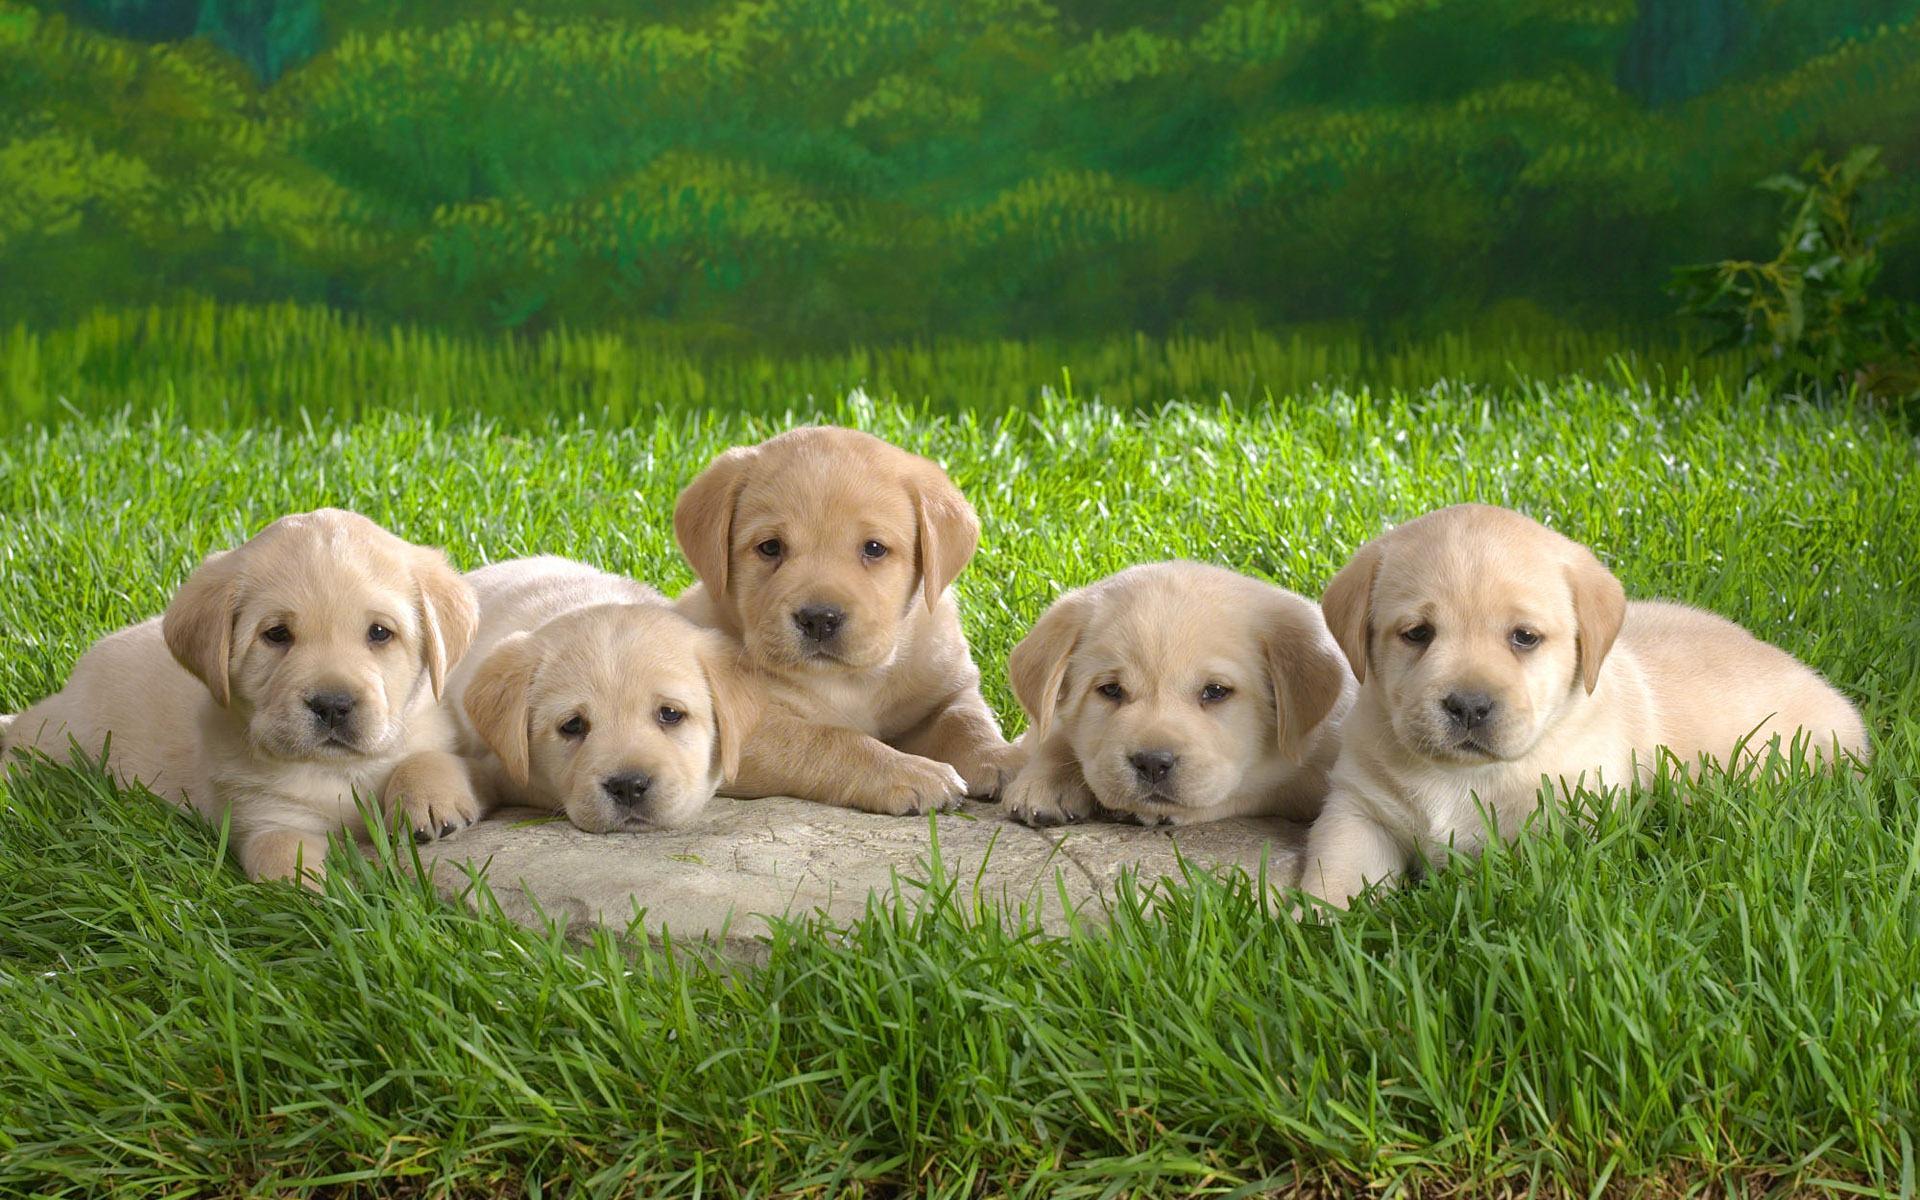 animals-Download-free-animals-Cute-Baby-Animals-wallpaper-wpc5802130